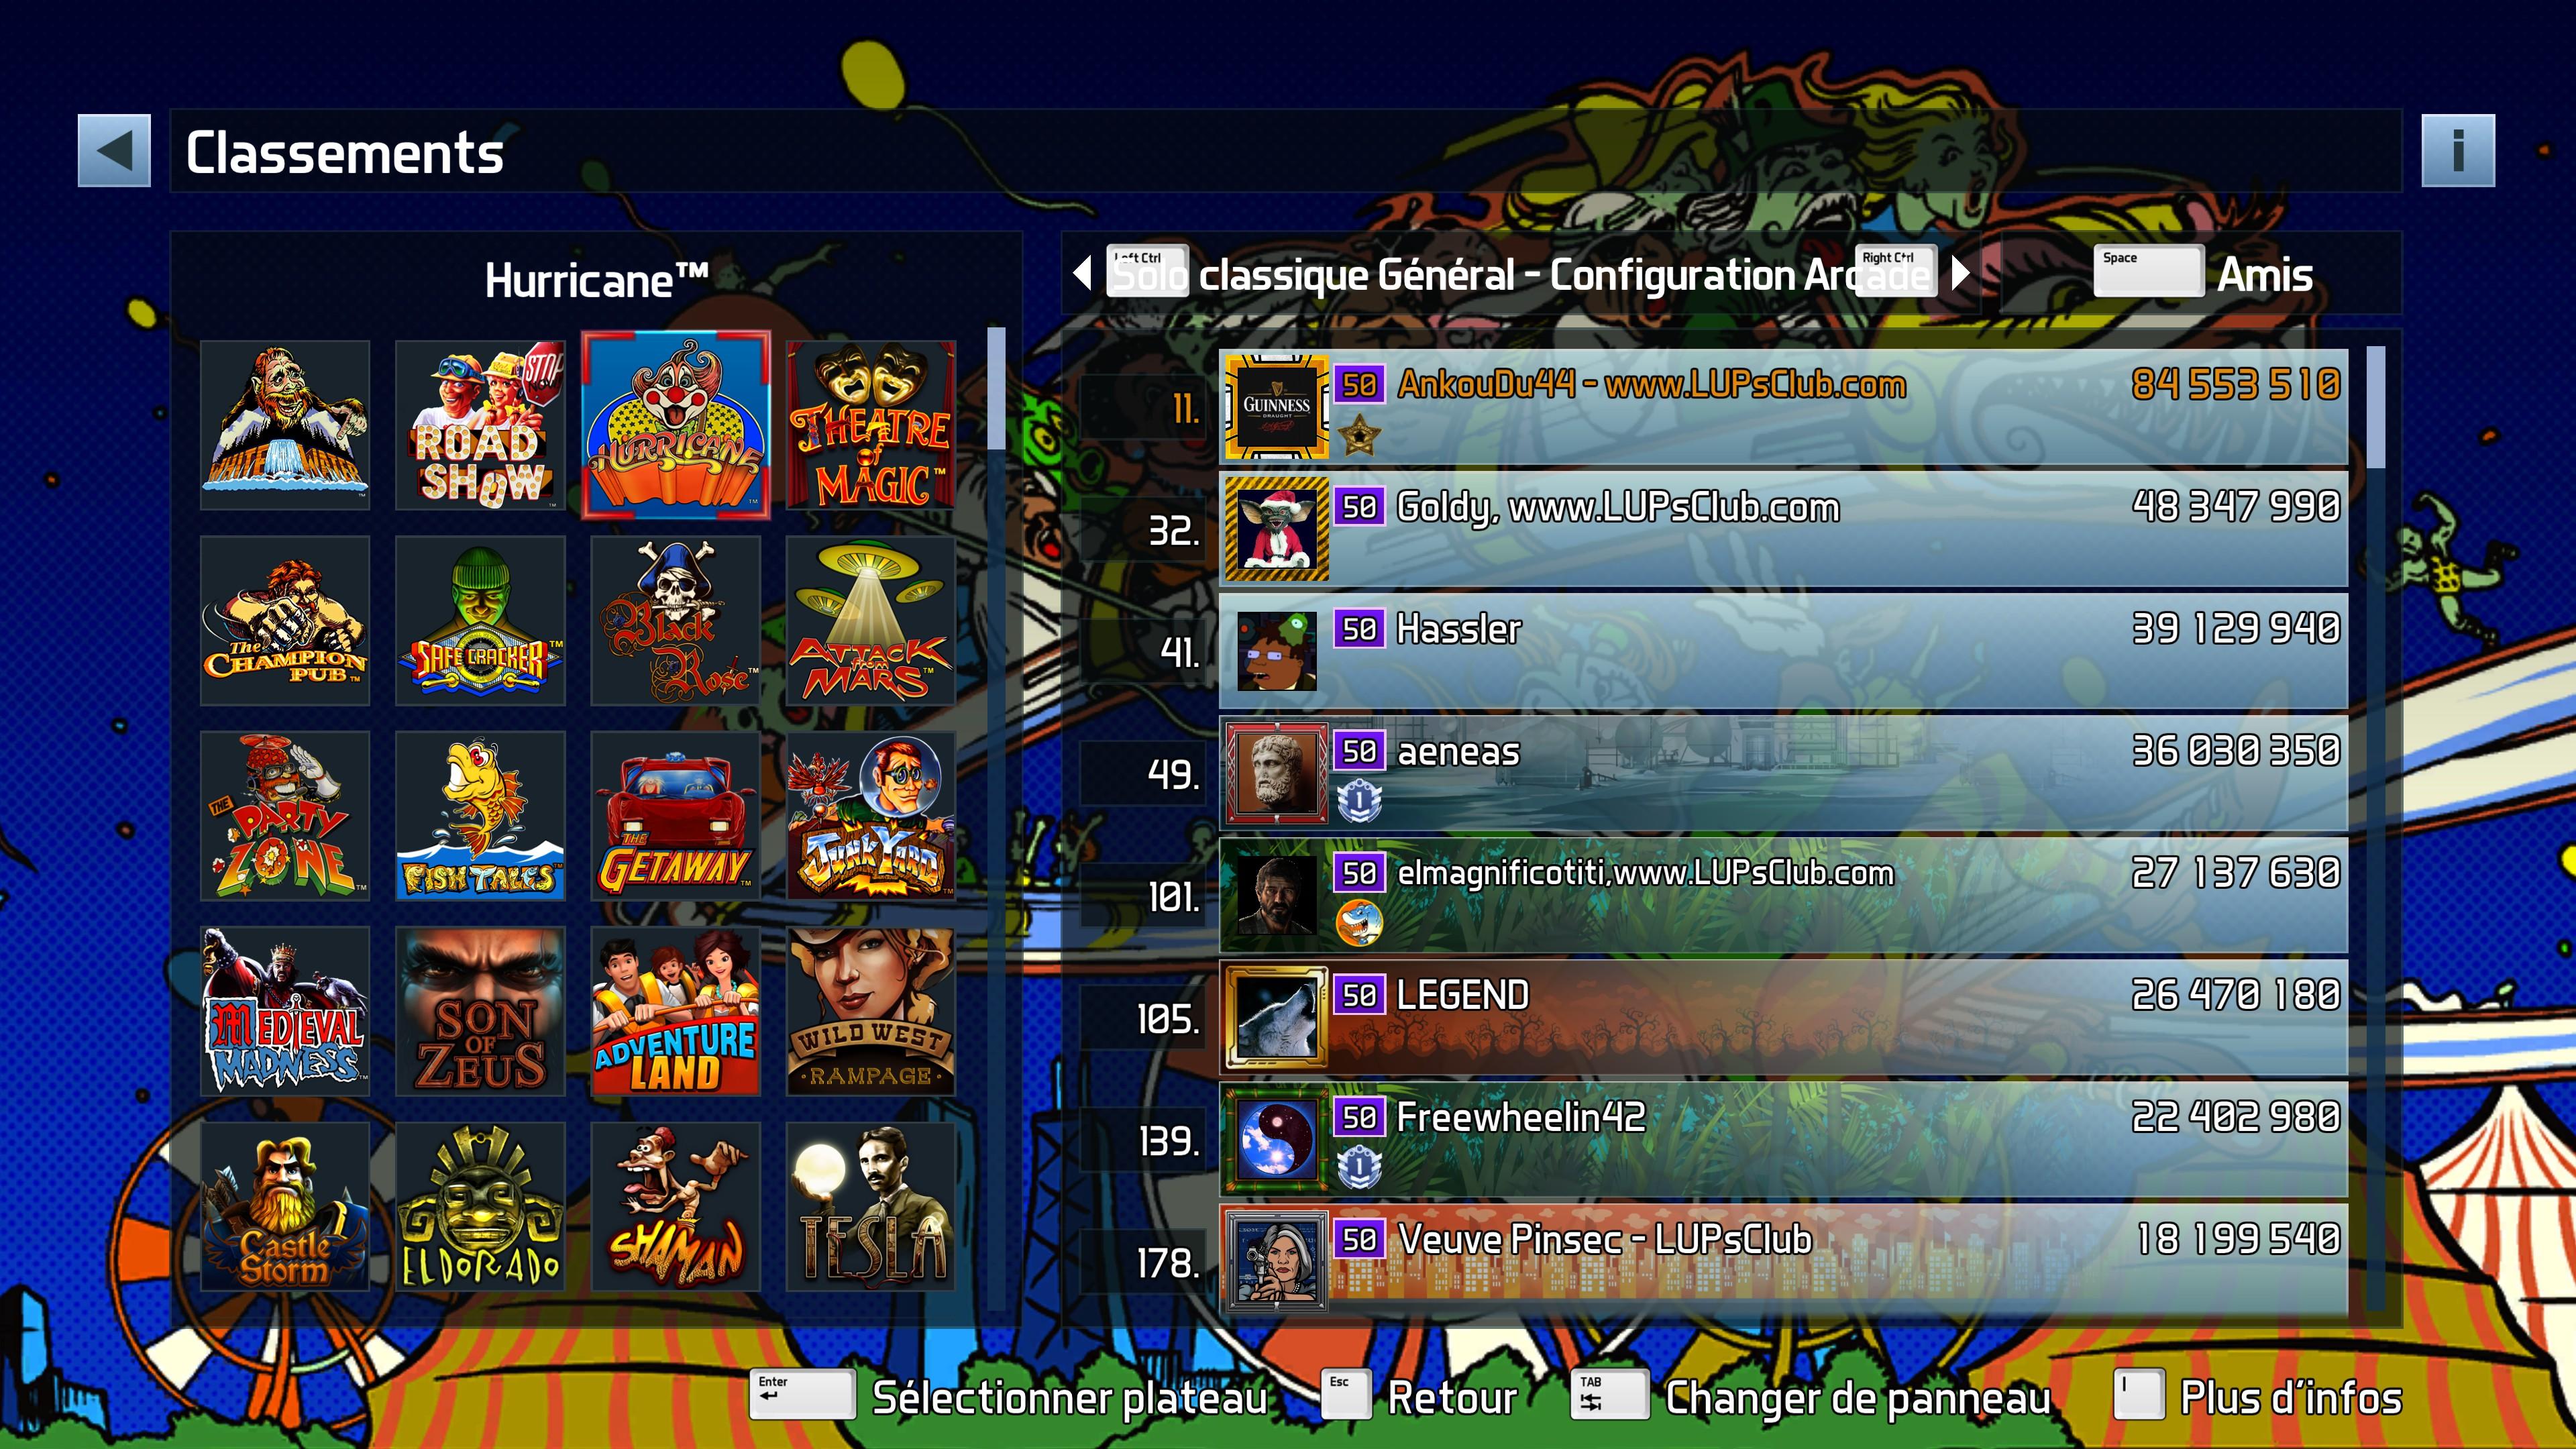 LUP's Club TdM 06.19 : Williams Pinball Vol4 • Hurricane, Road Show, White Water - Page 2 0219E0D636979AAAC4424B63B7B13253625E33B9